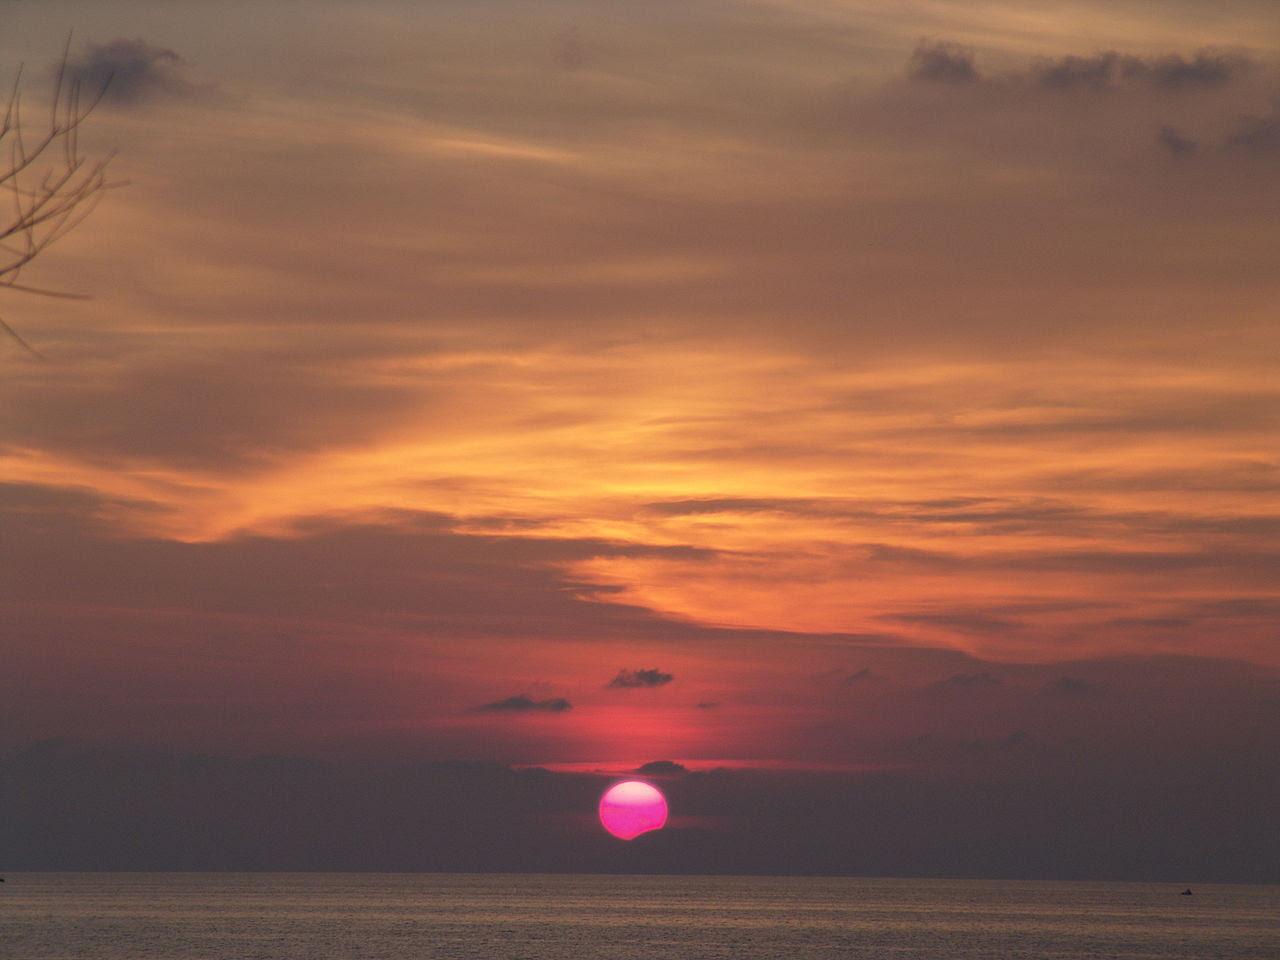 http://upload.wikimedia.org/wikipedia/commons/thumb/5/52/Sunset_in_Ricadi.jpg/1280px-Sunset_in_Ricadi.jpg